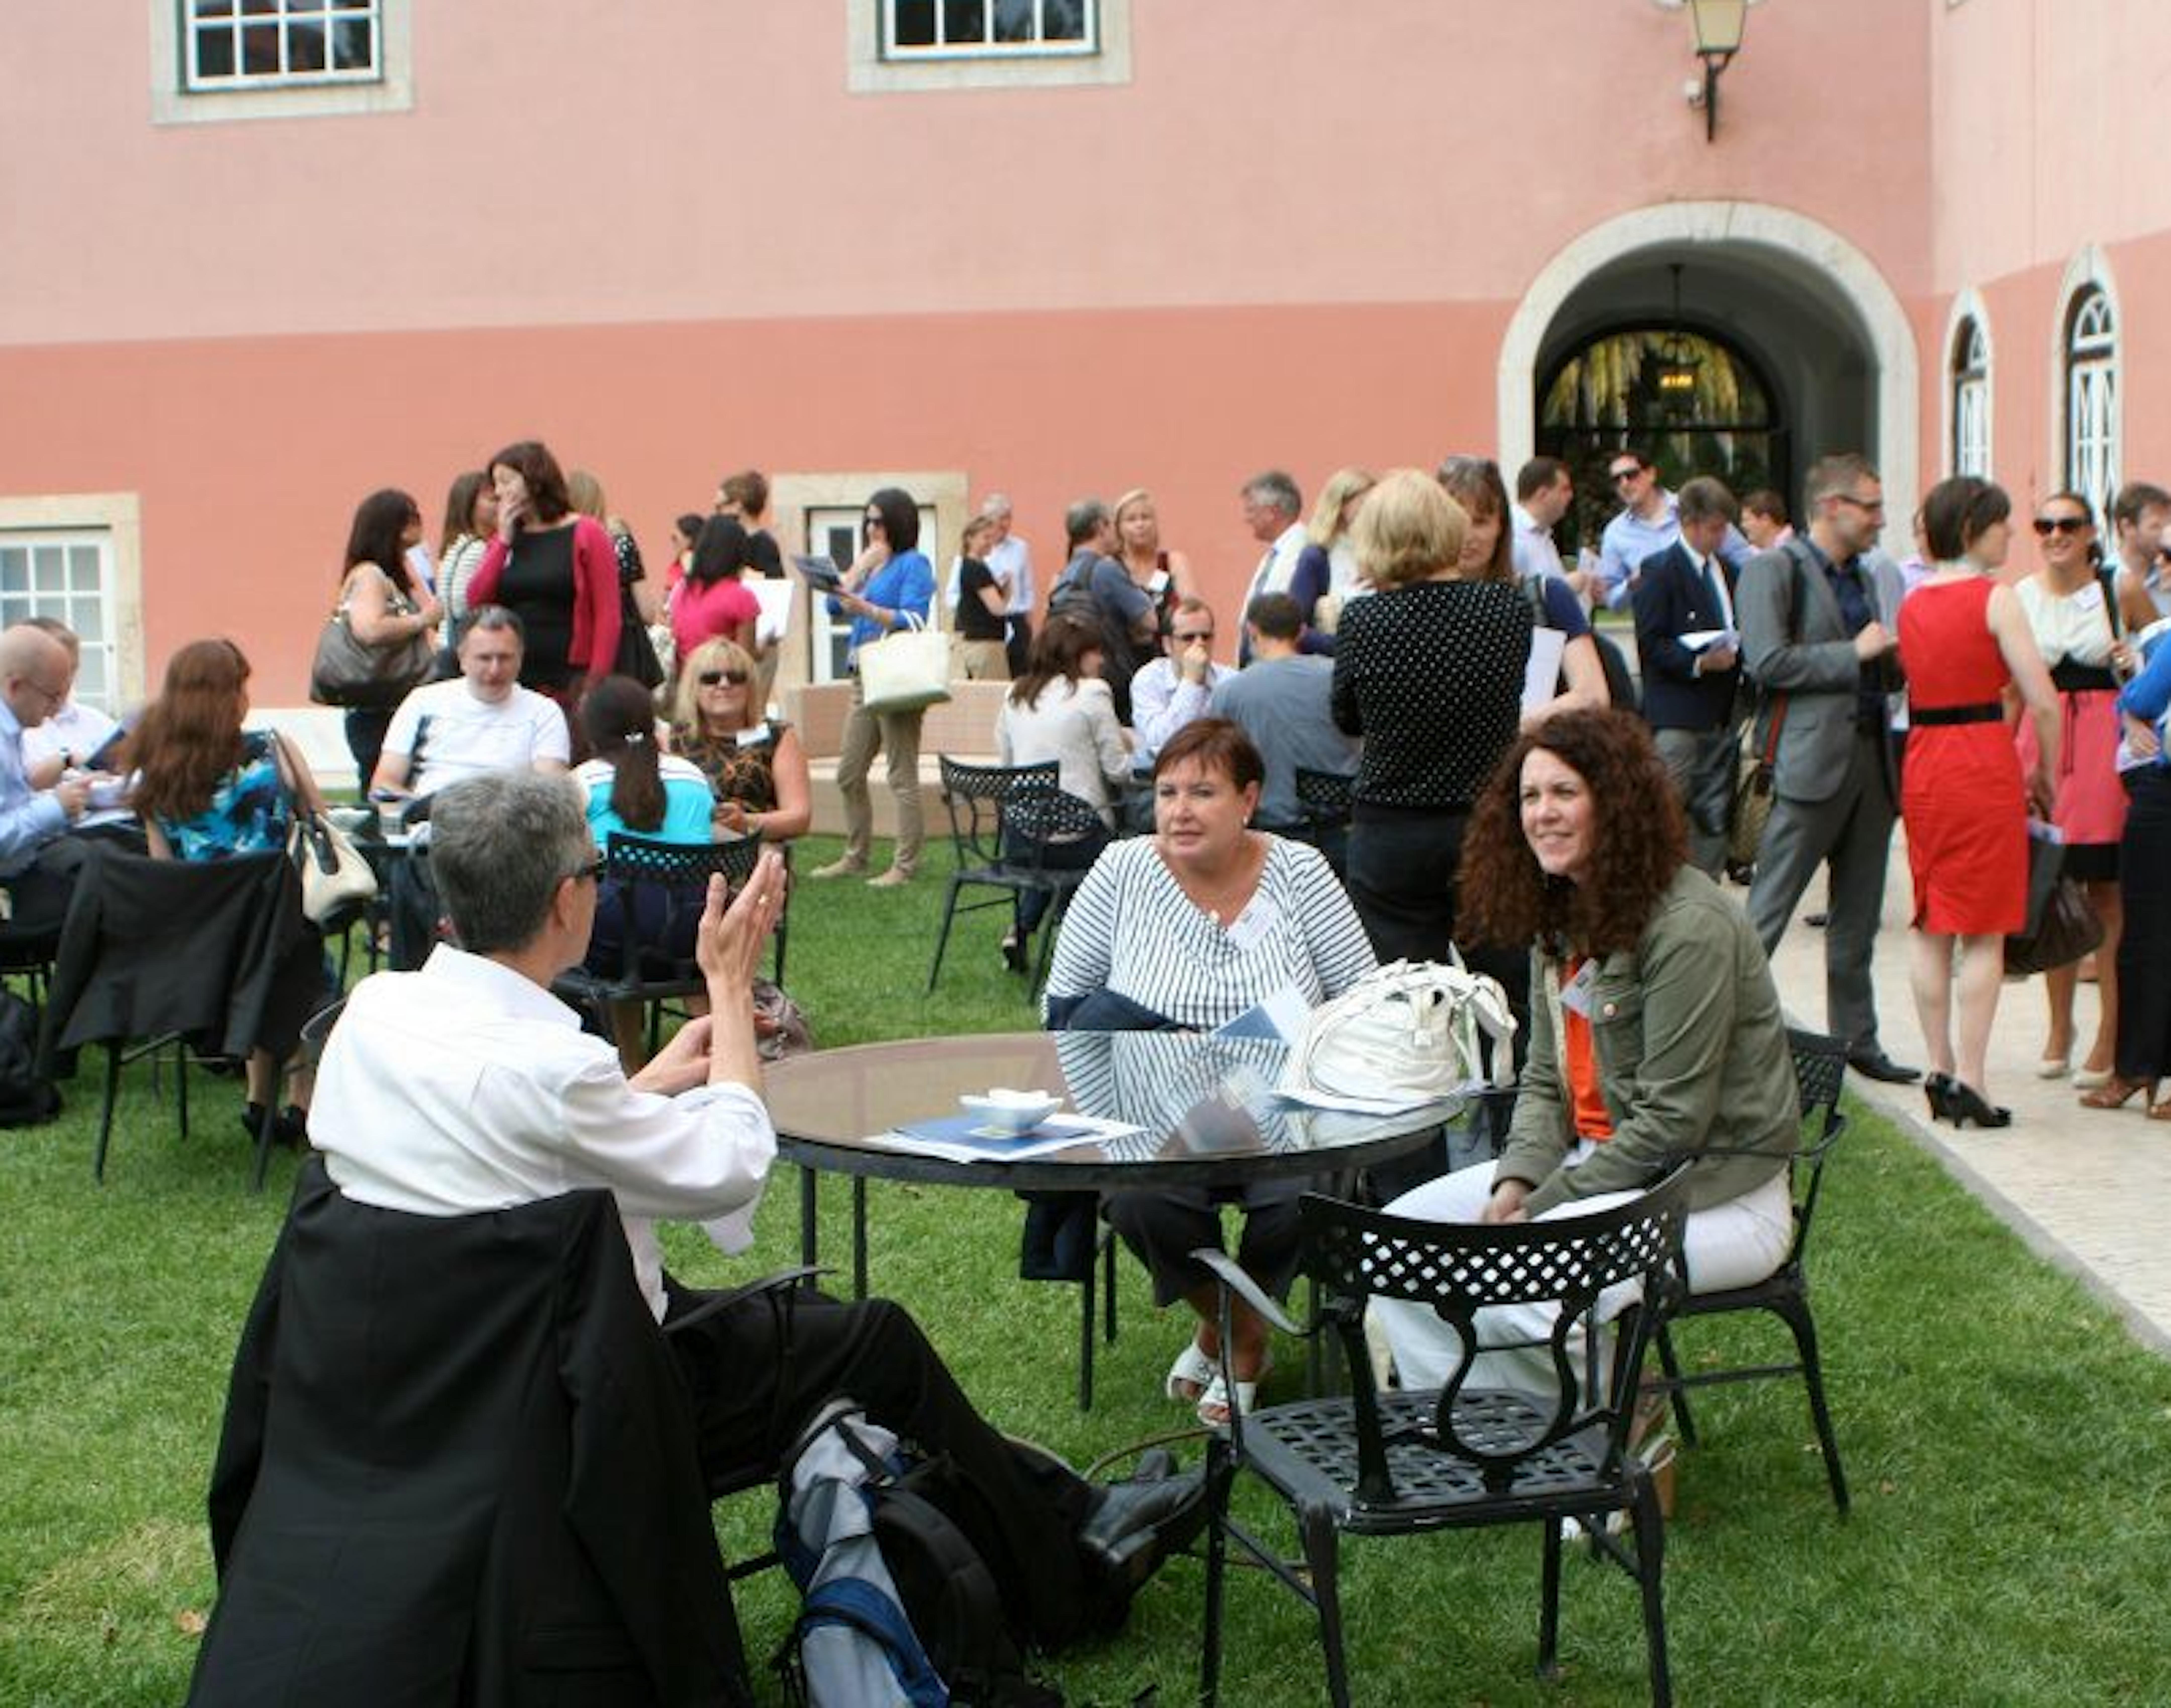 Employee Benefits Summit 2012